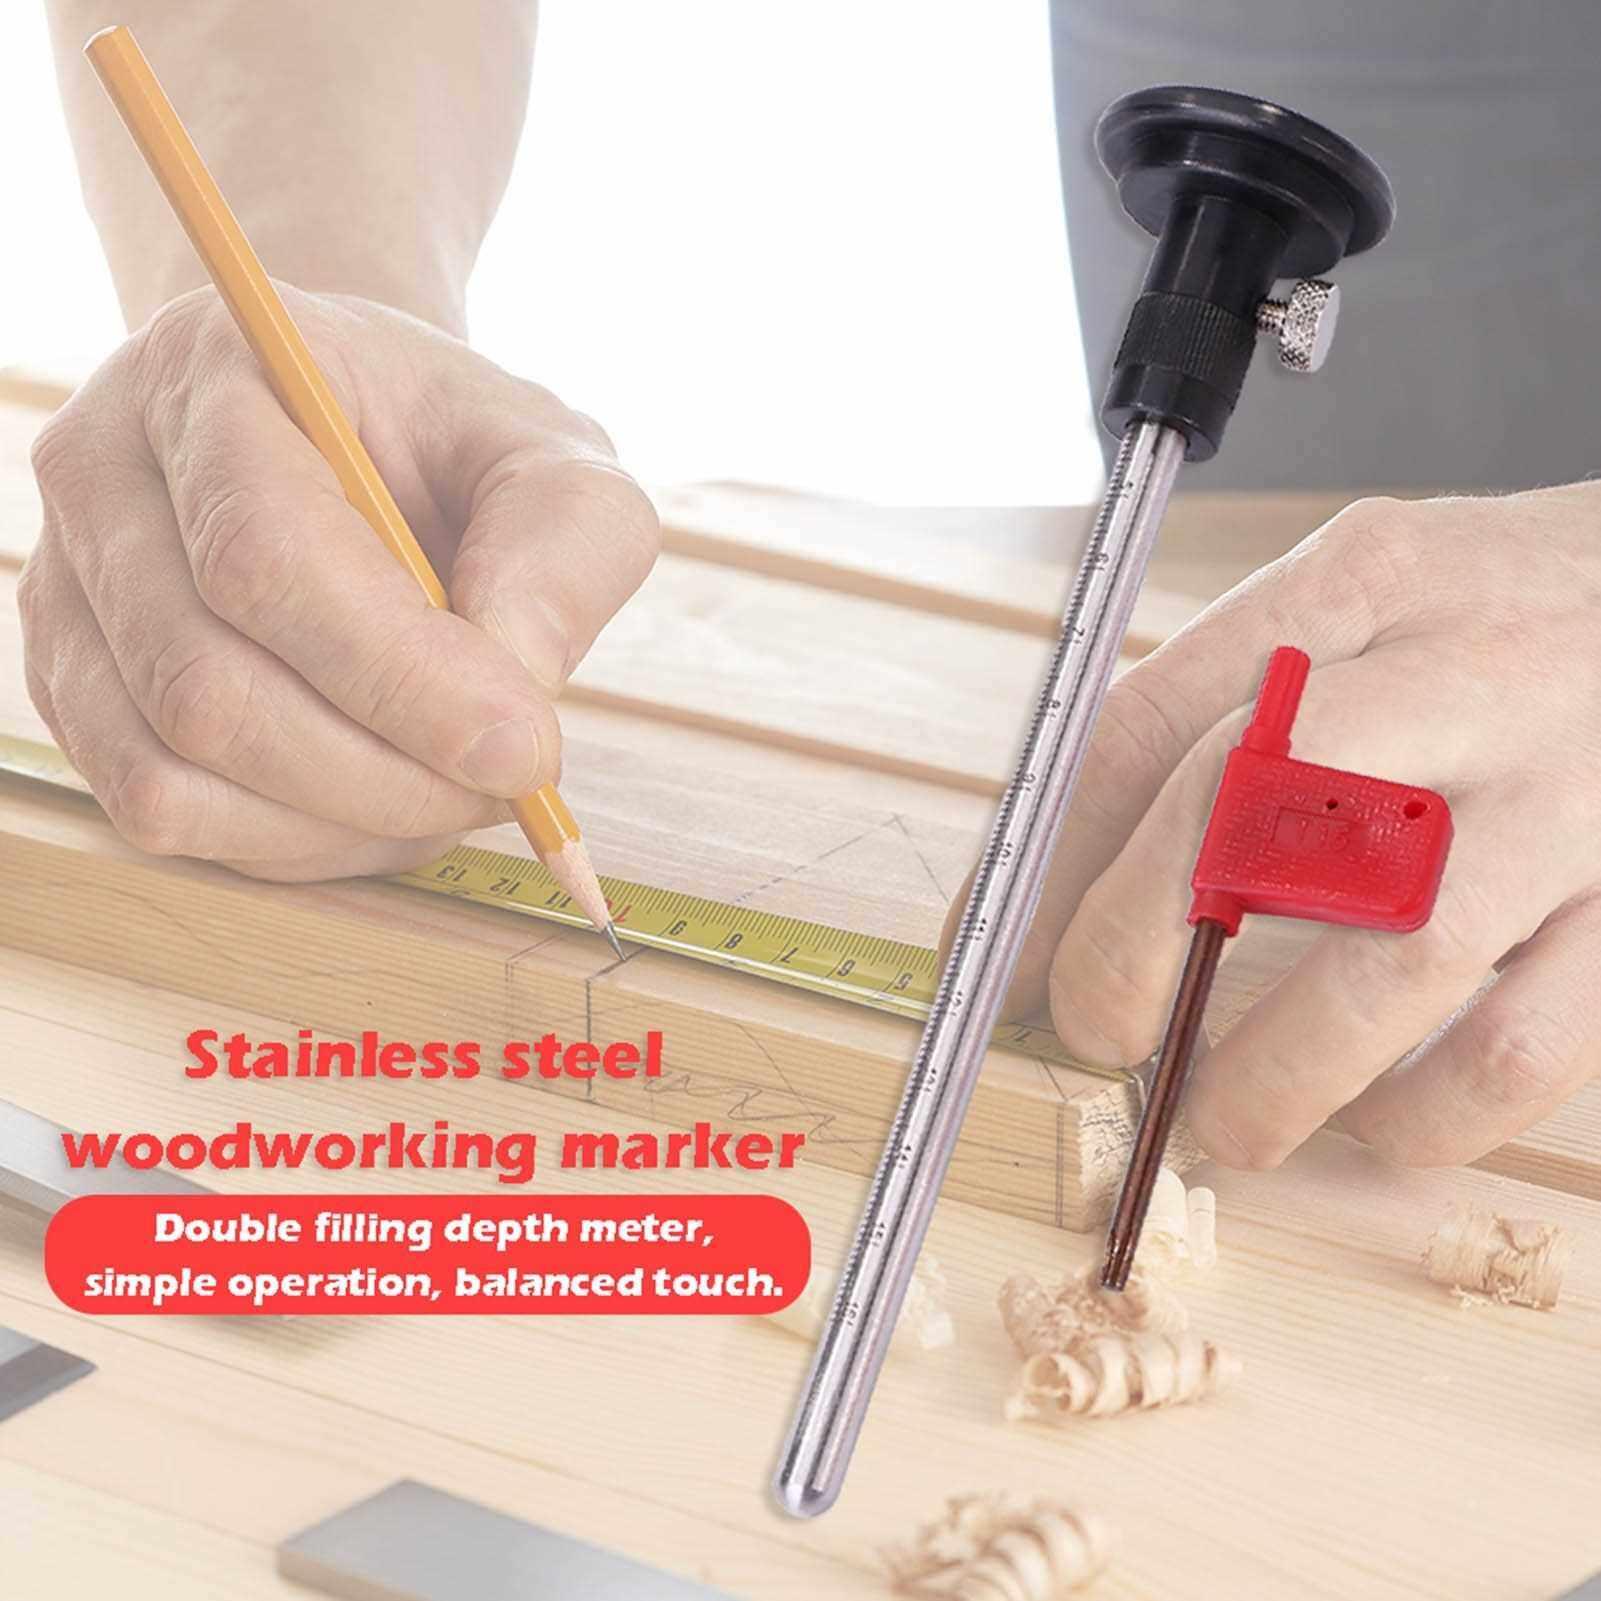 Wheel Marking Gauge with Scale Woodworking Scribers Stainless Steel Woodworking Tool (Standard)